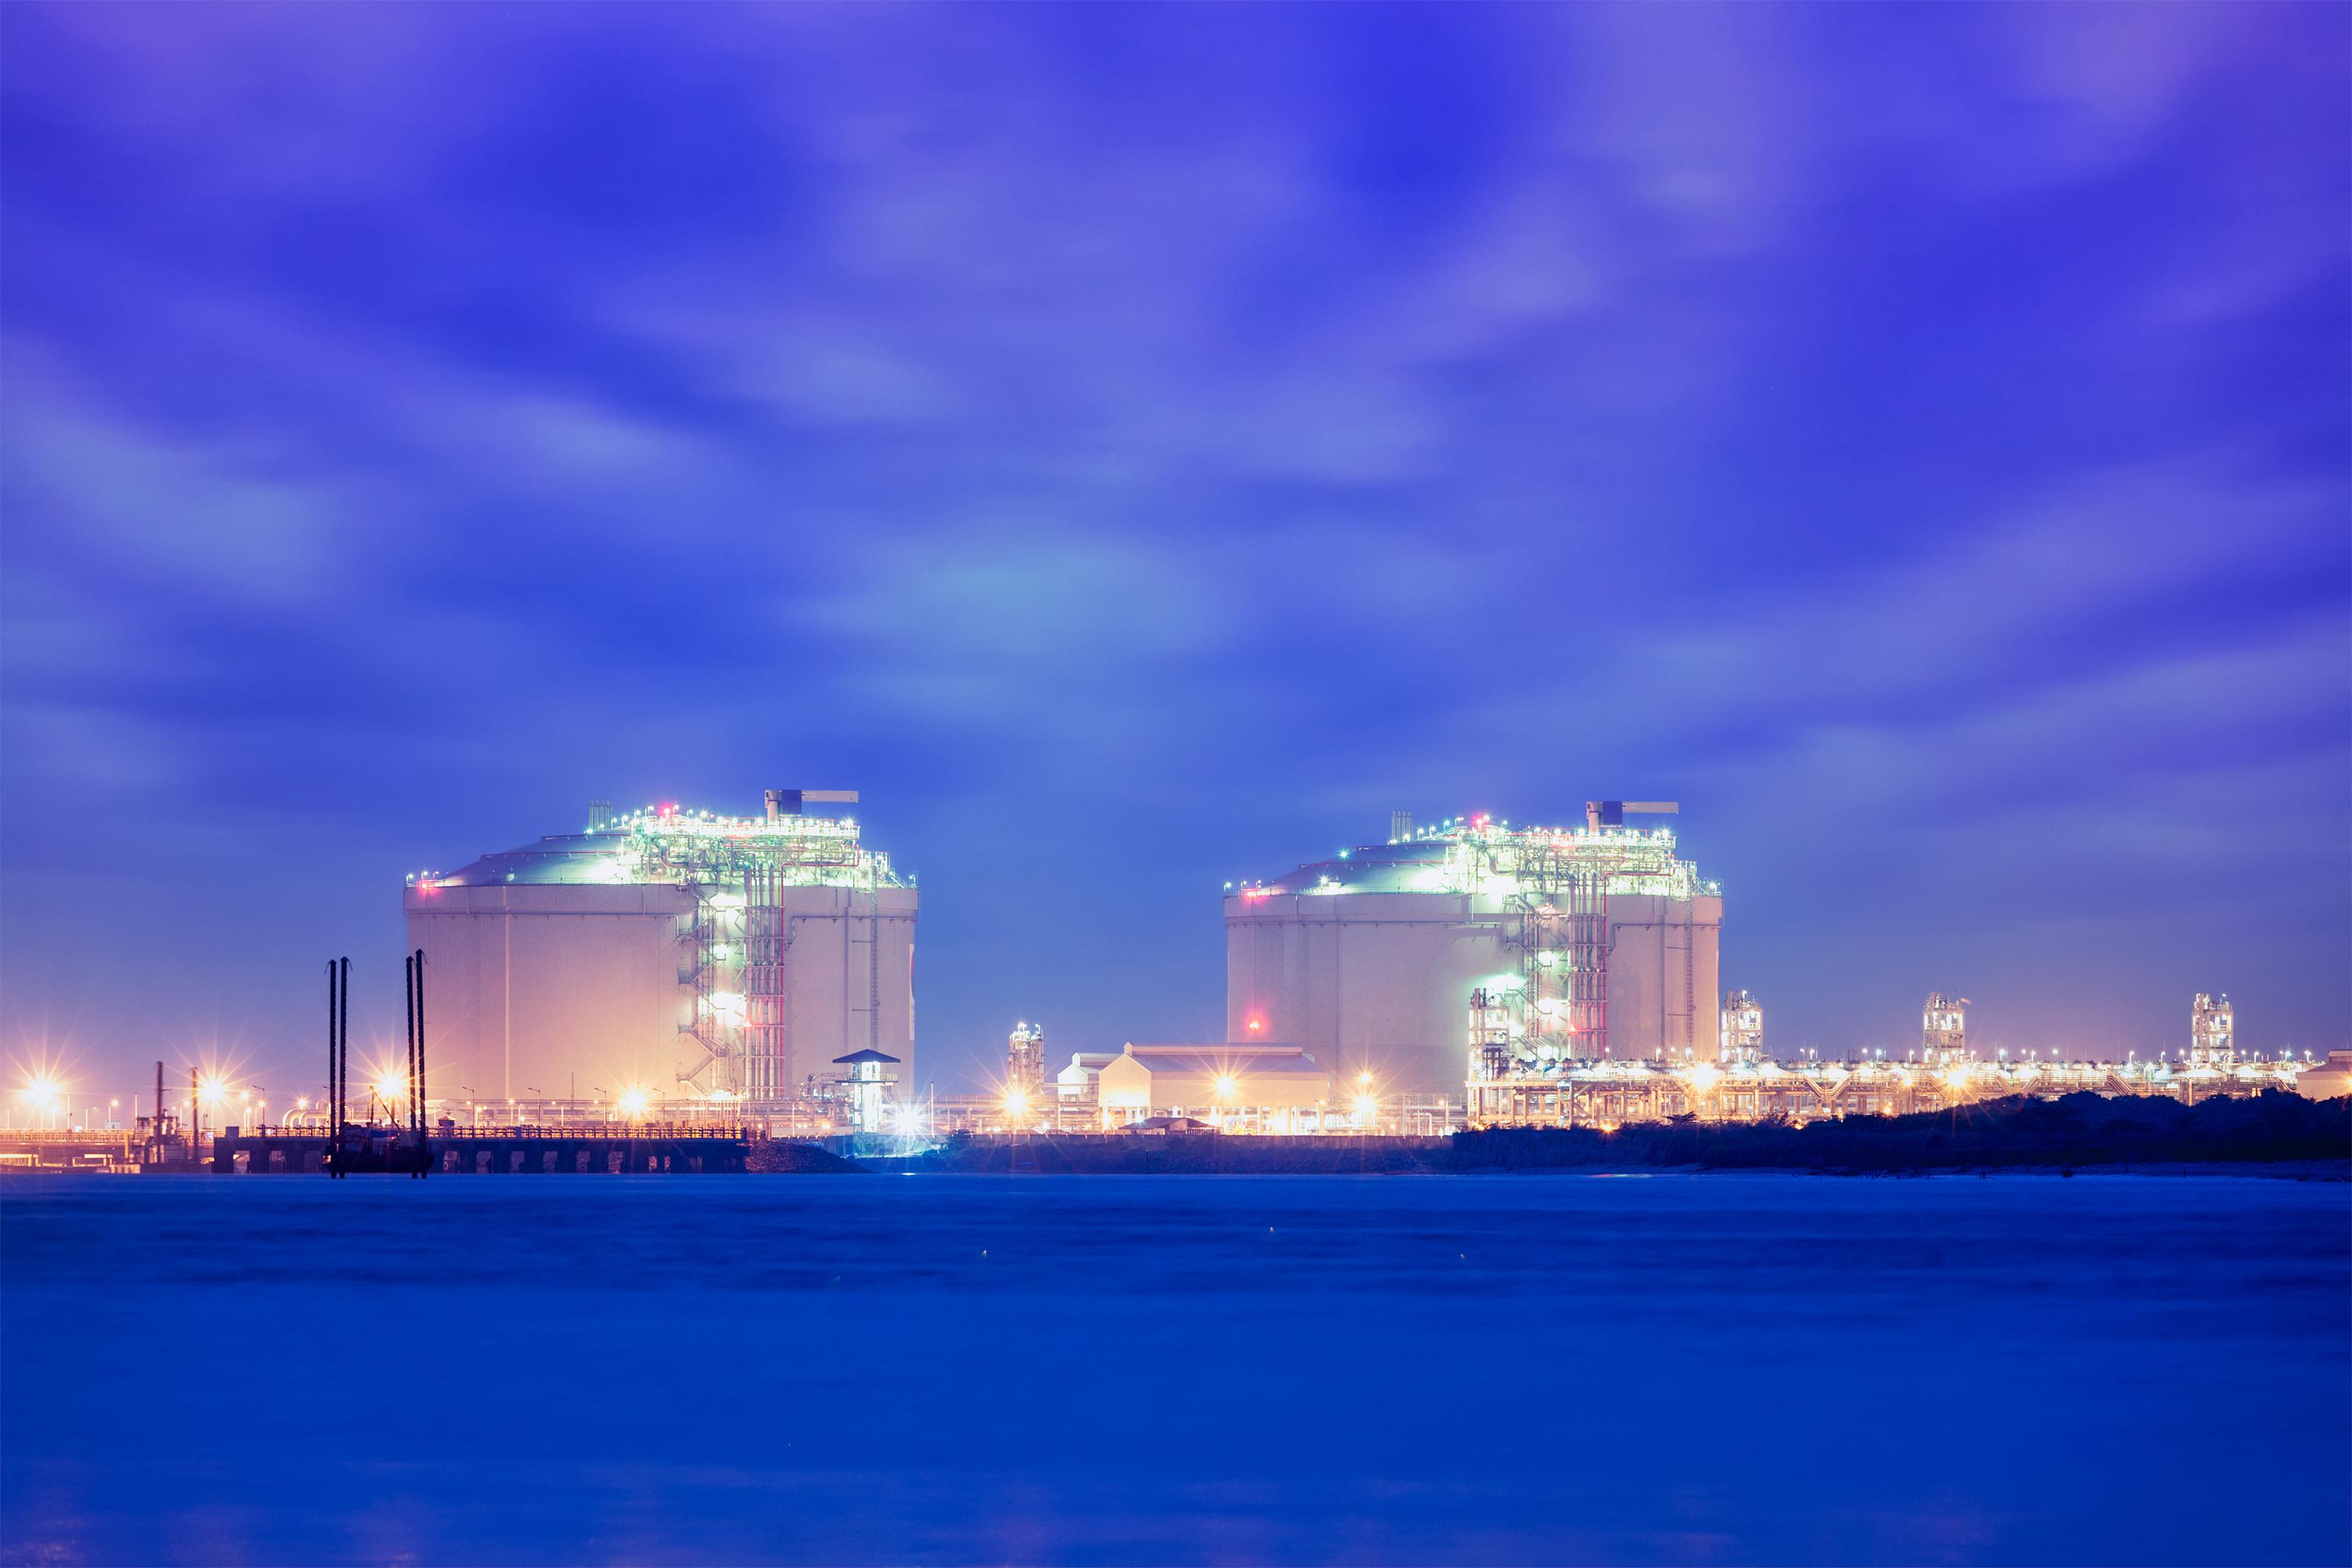 An LNG facility at twilight.